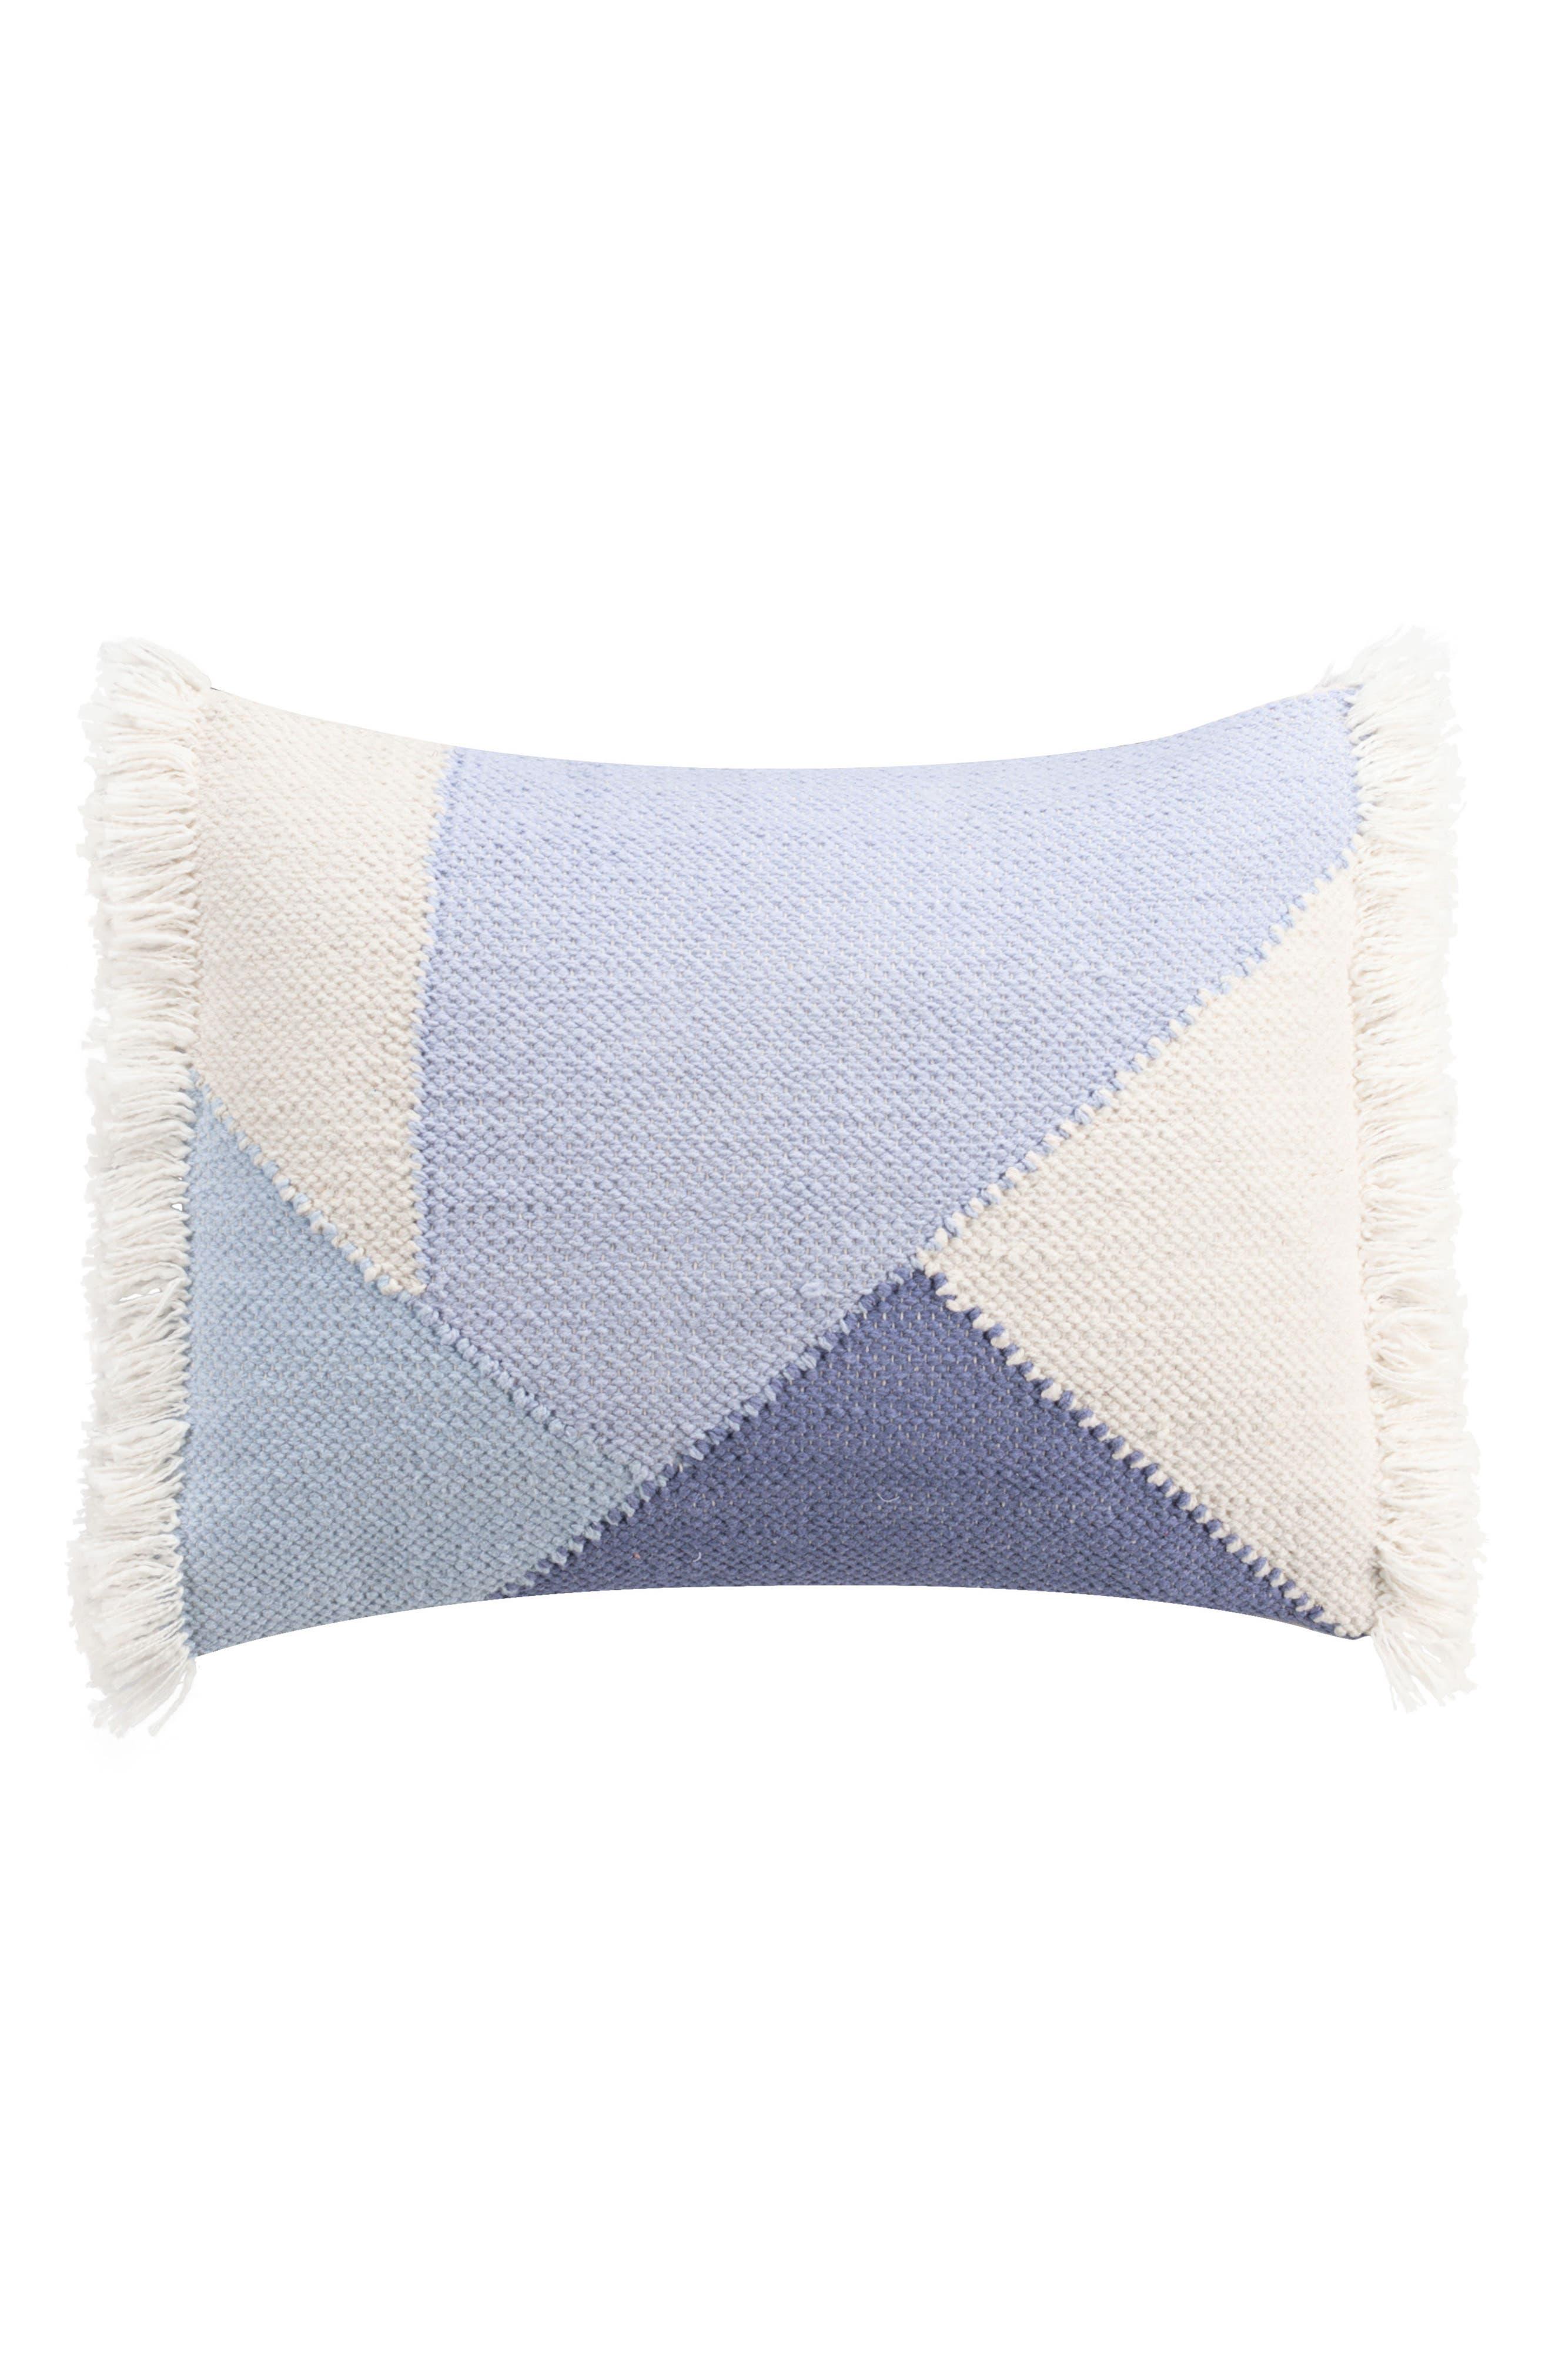 Main Image - cupcakes & cashmere Mosaic Tile Accent Pillow